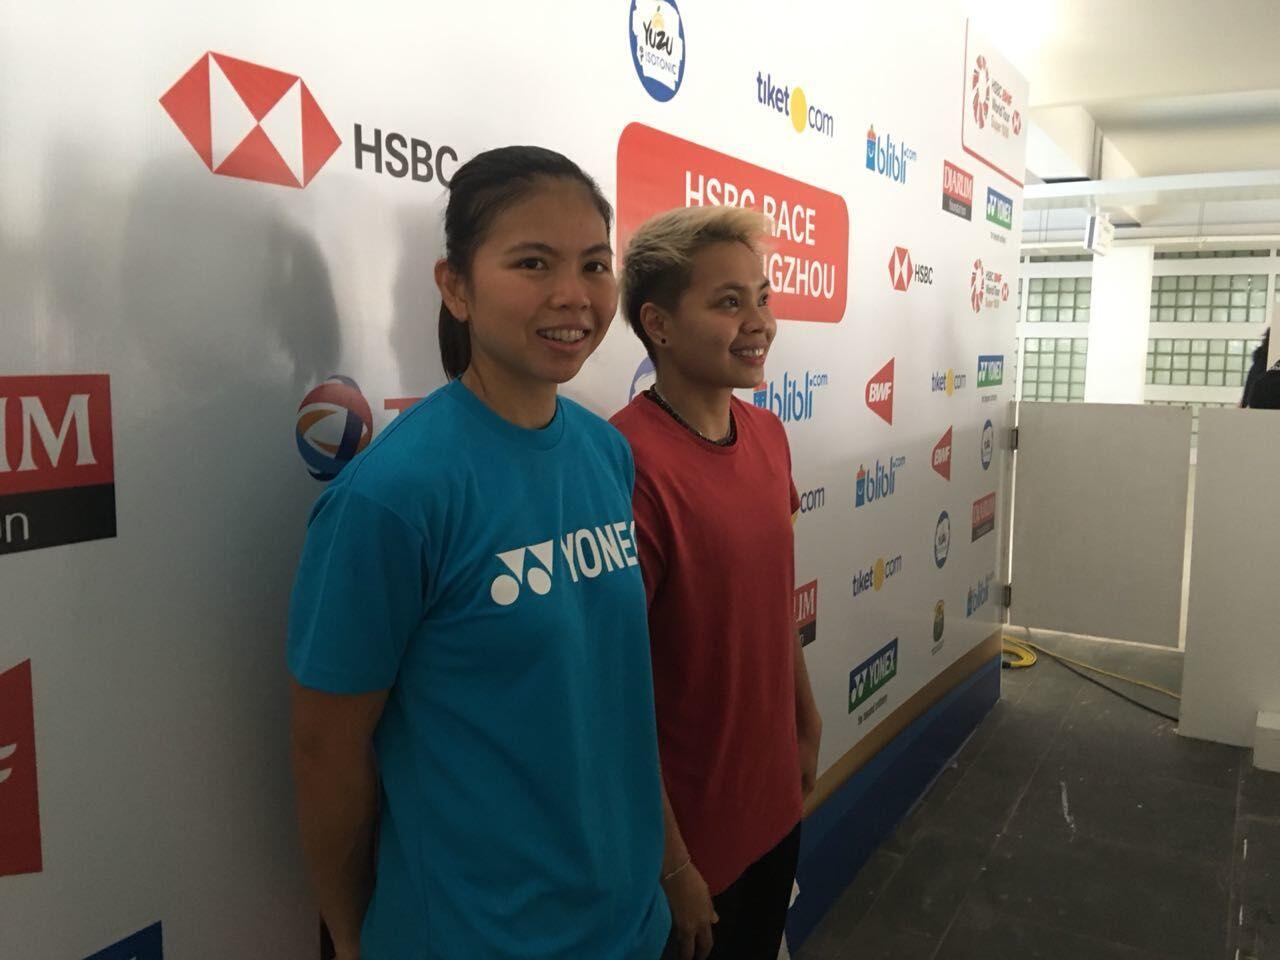 Polii/Rahayu Lolos Perempat Final Indonesia Open 2018